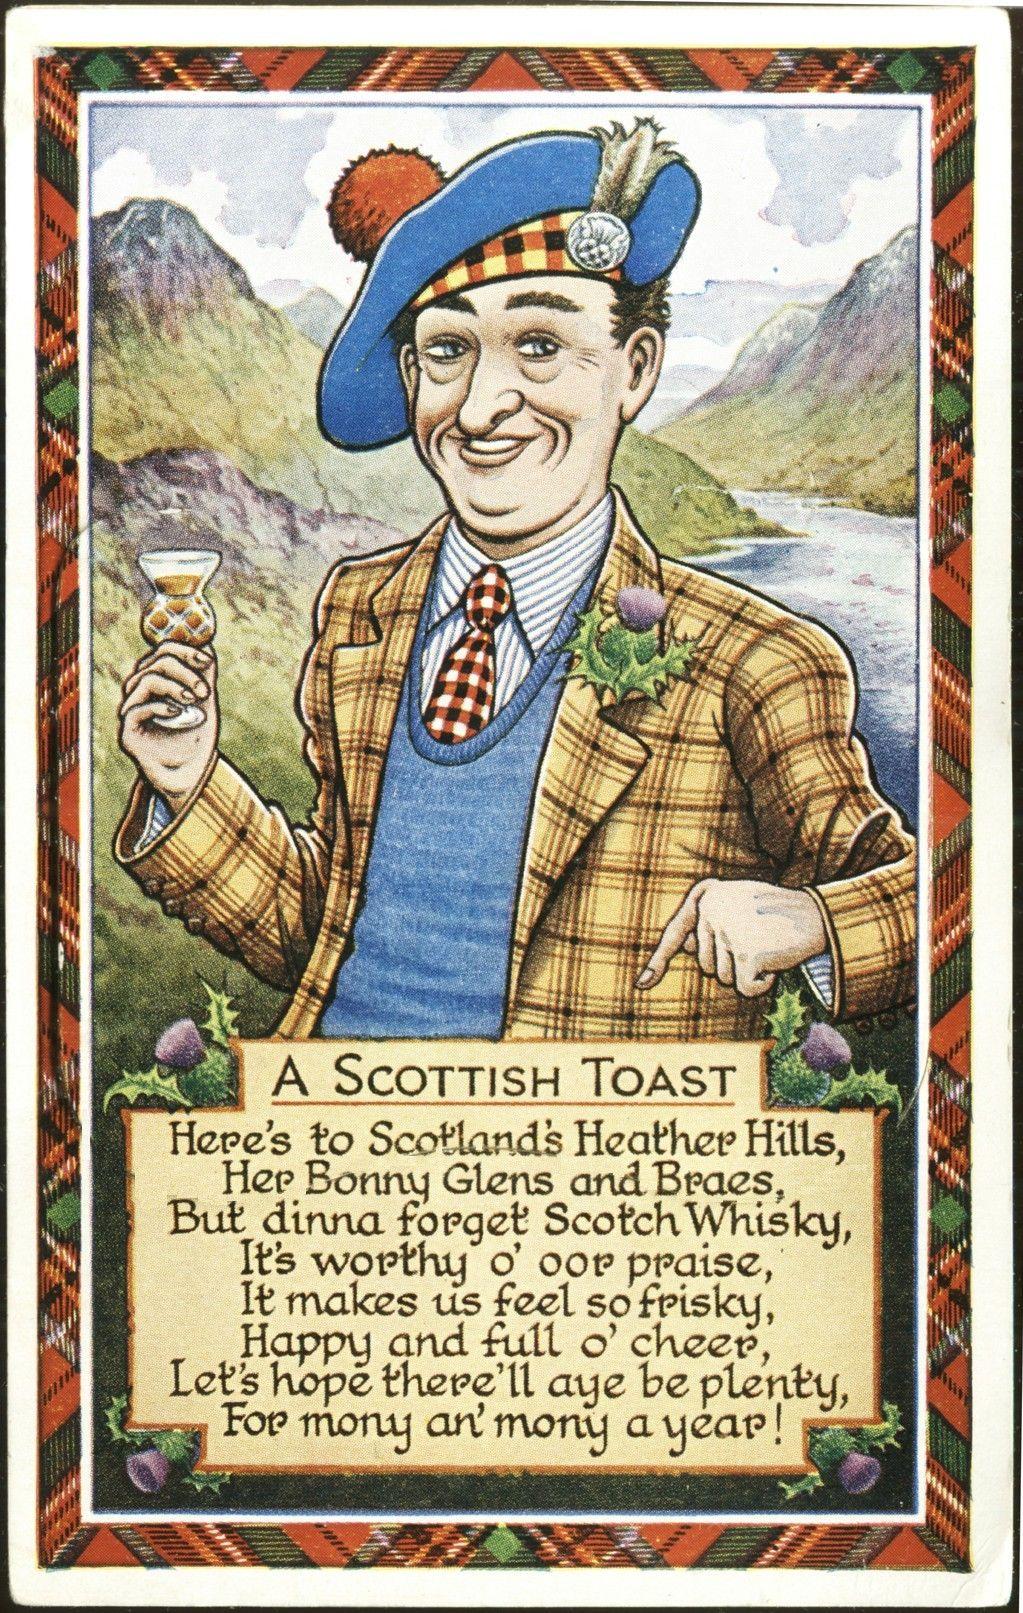 Scottishmantoastpostcardg jpeg image 1023 1613 pixels a scottish toast kristyandbryce Choice Image